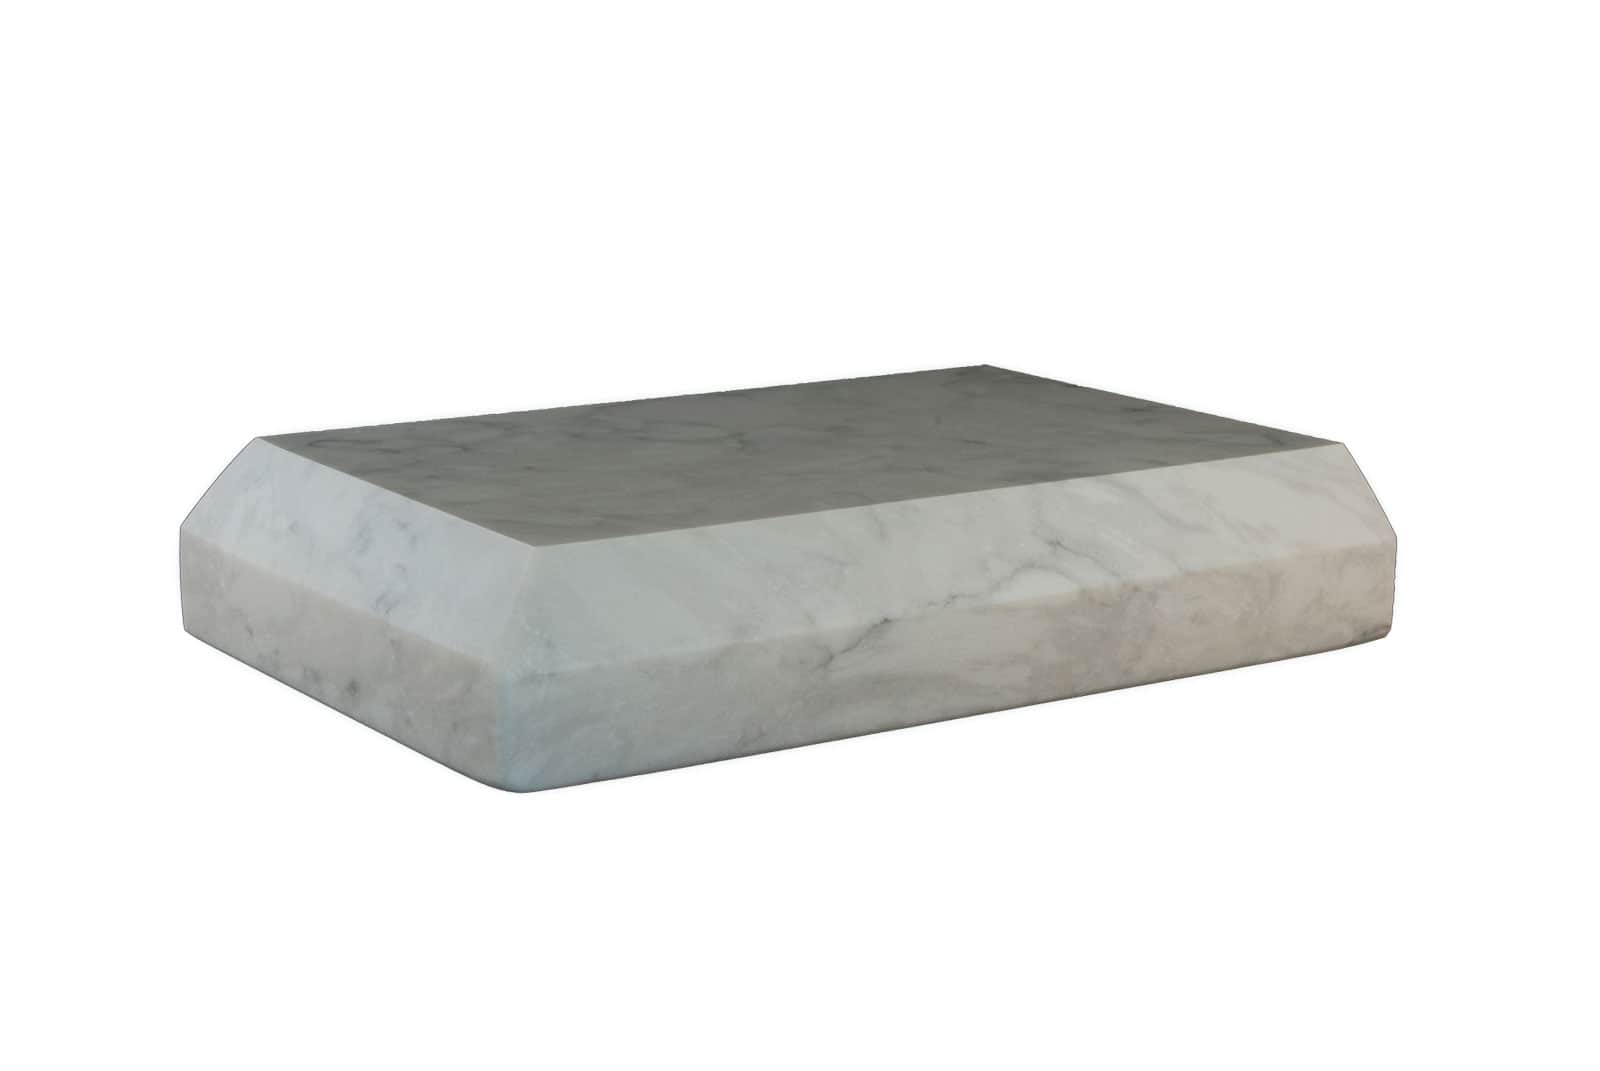 artistic-granite-designs-edges-fabrications-1_25x5_8x5_8-bevel-6074